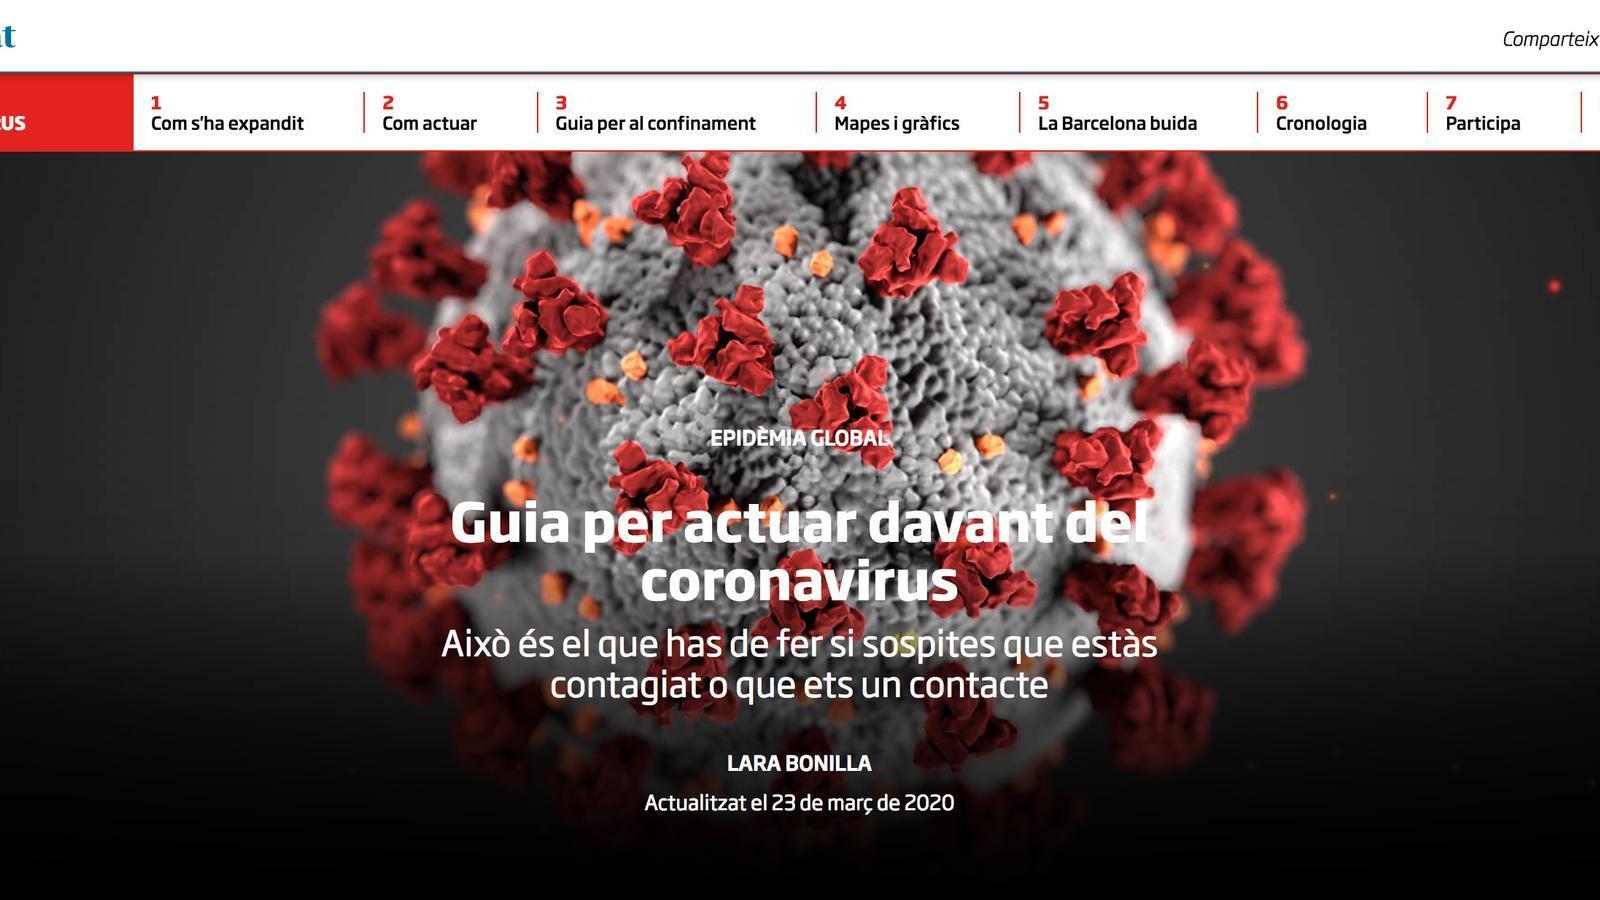 Guia per actuar davant del coronavirus